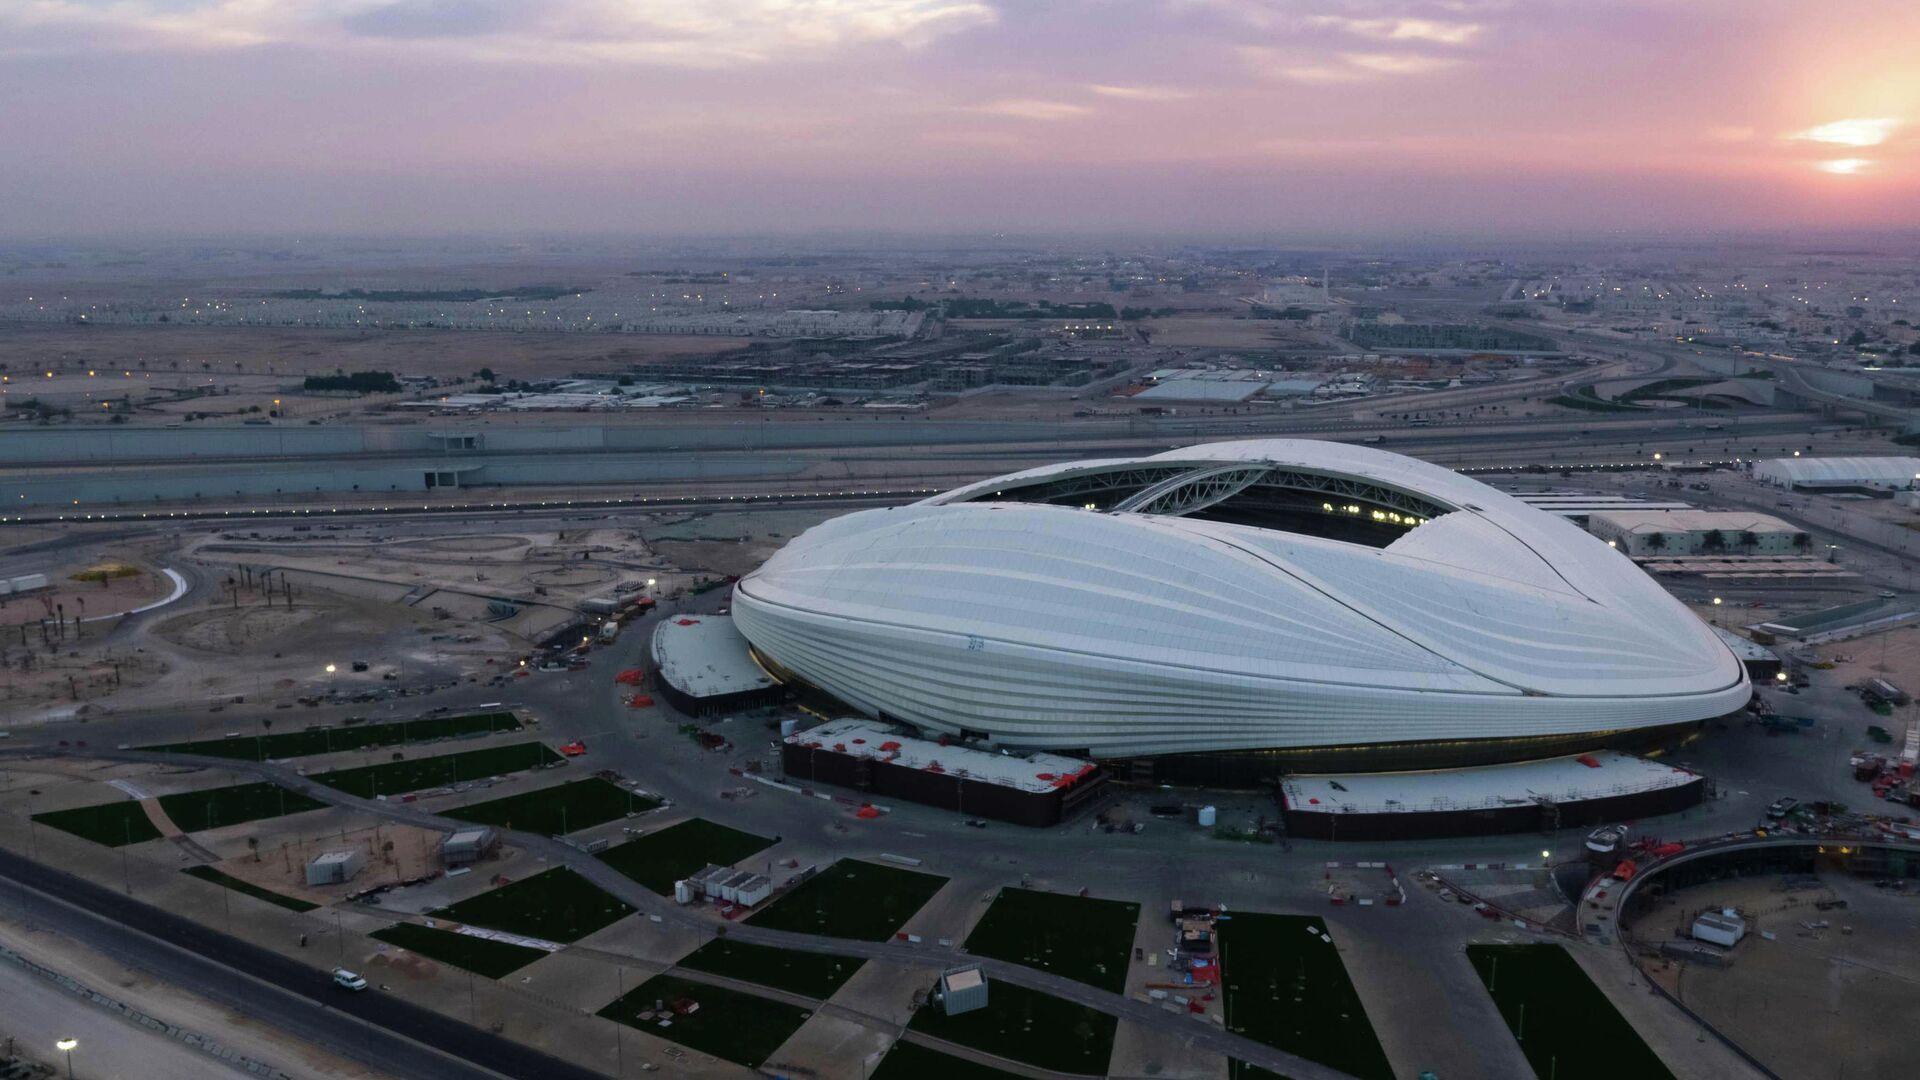 Стадион Аль-Вакра в Катаре - РИА Новости, 1920, 09.03.2021